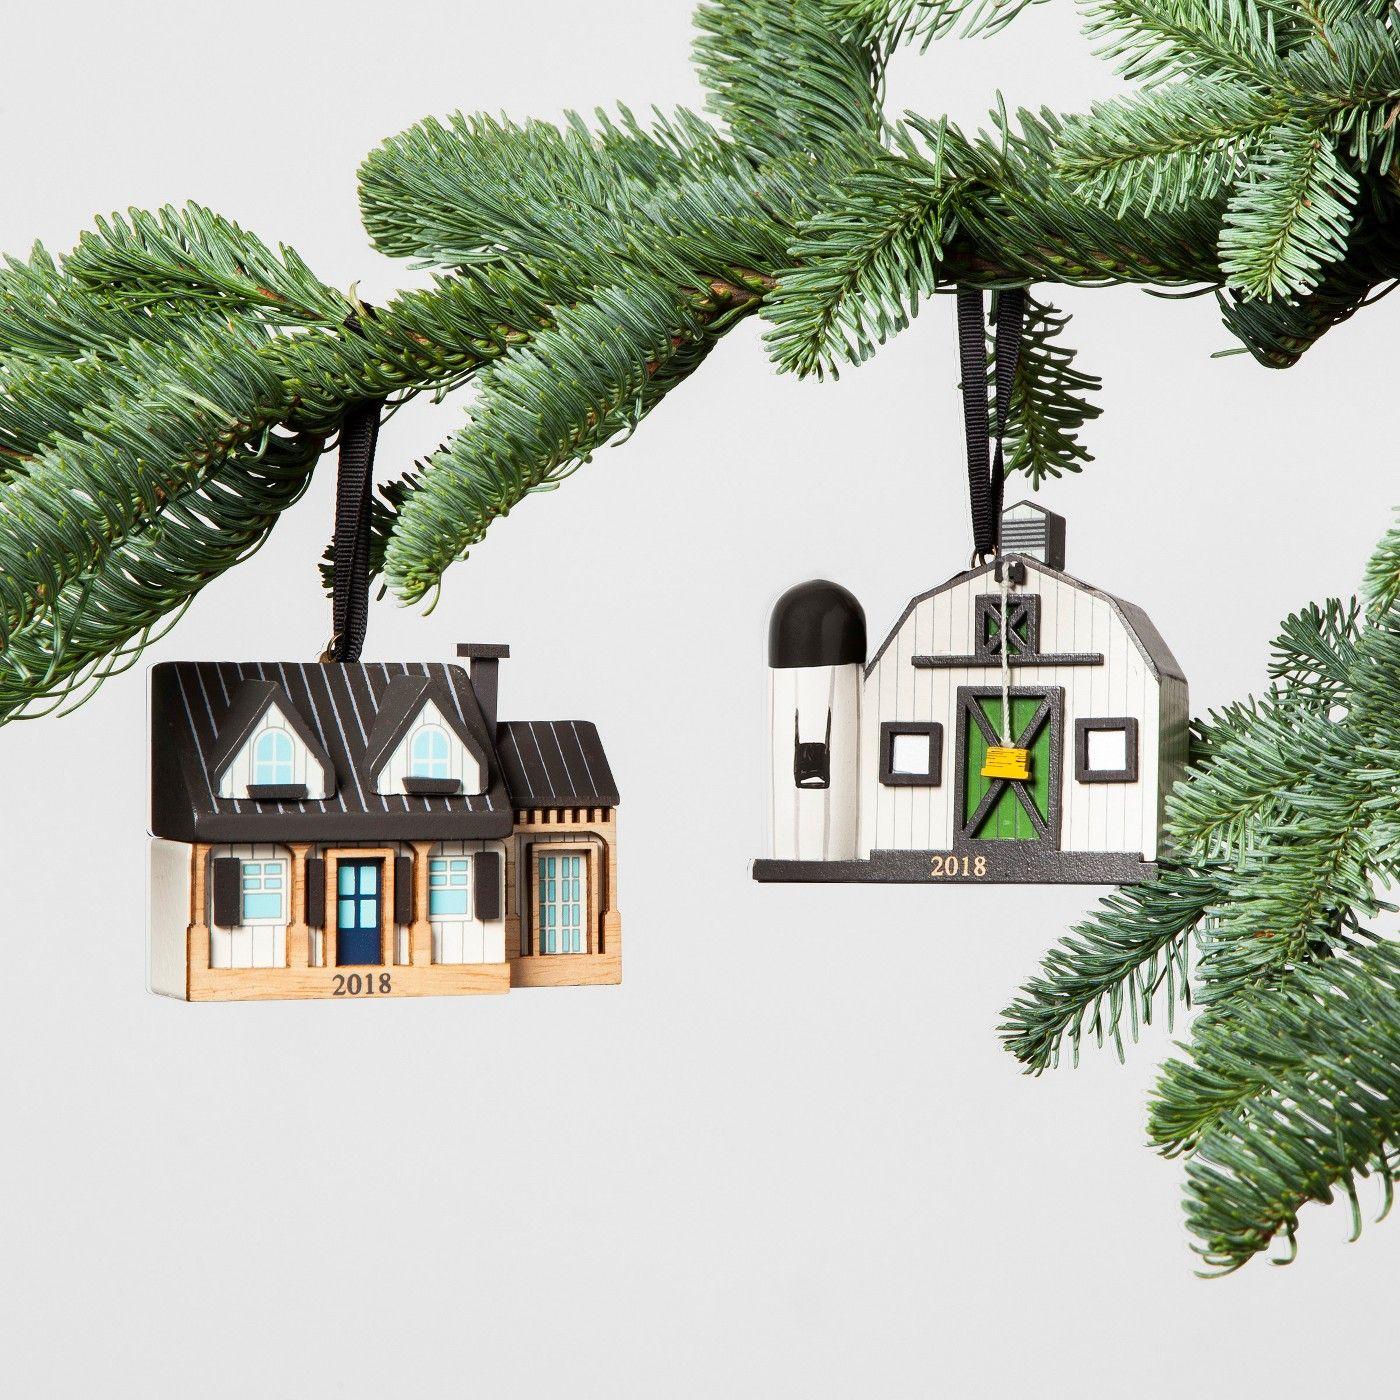 Joanna Gaines Turned Her Farmhouse Into A Christmas Ornament